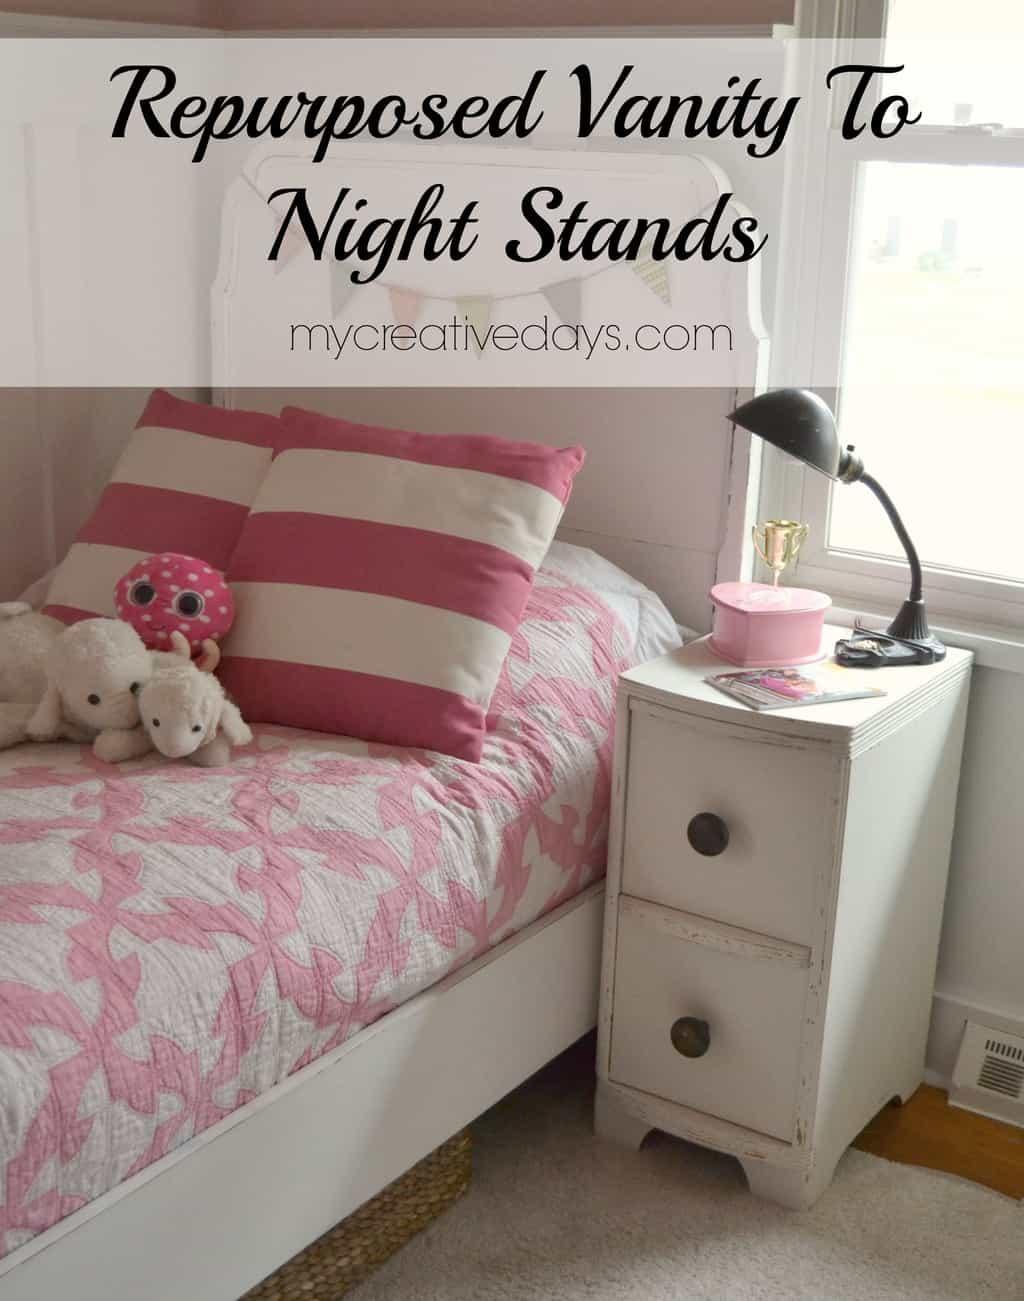 Repurposed Vanity To Night Stands  mycreativedays.com